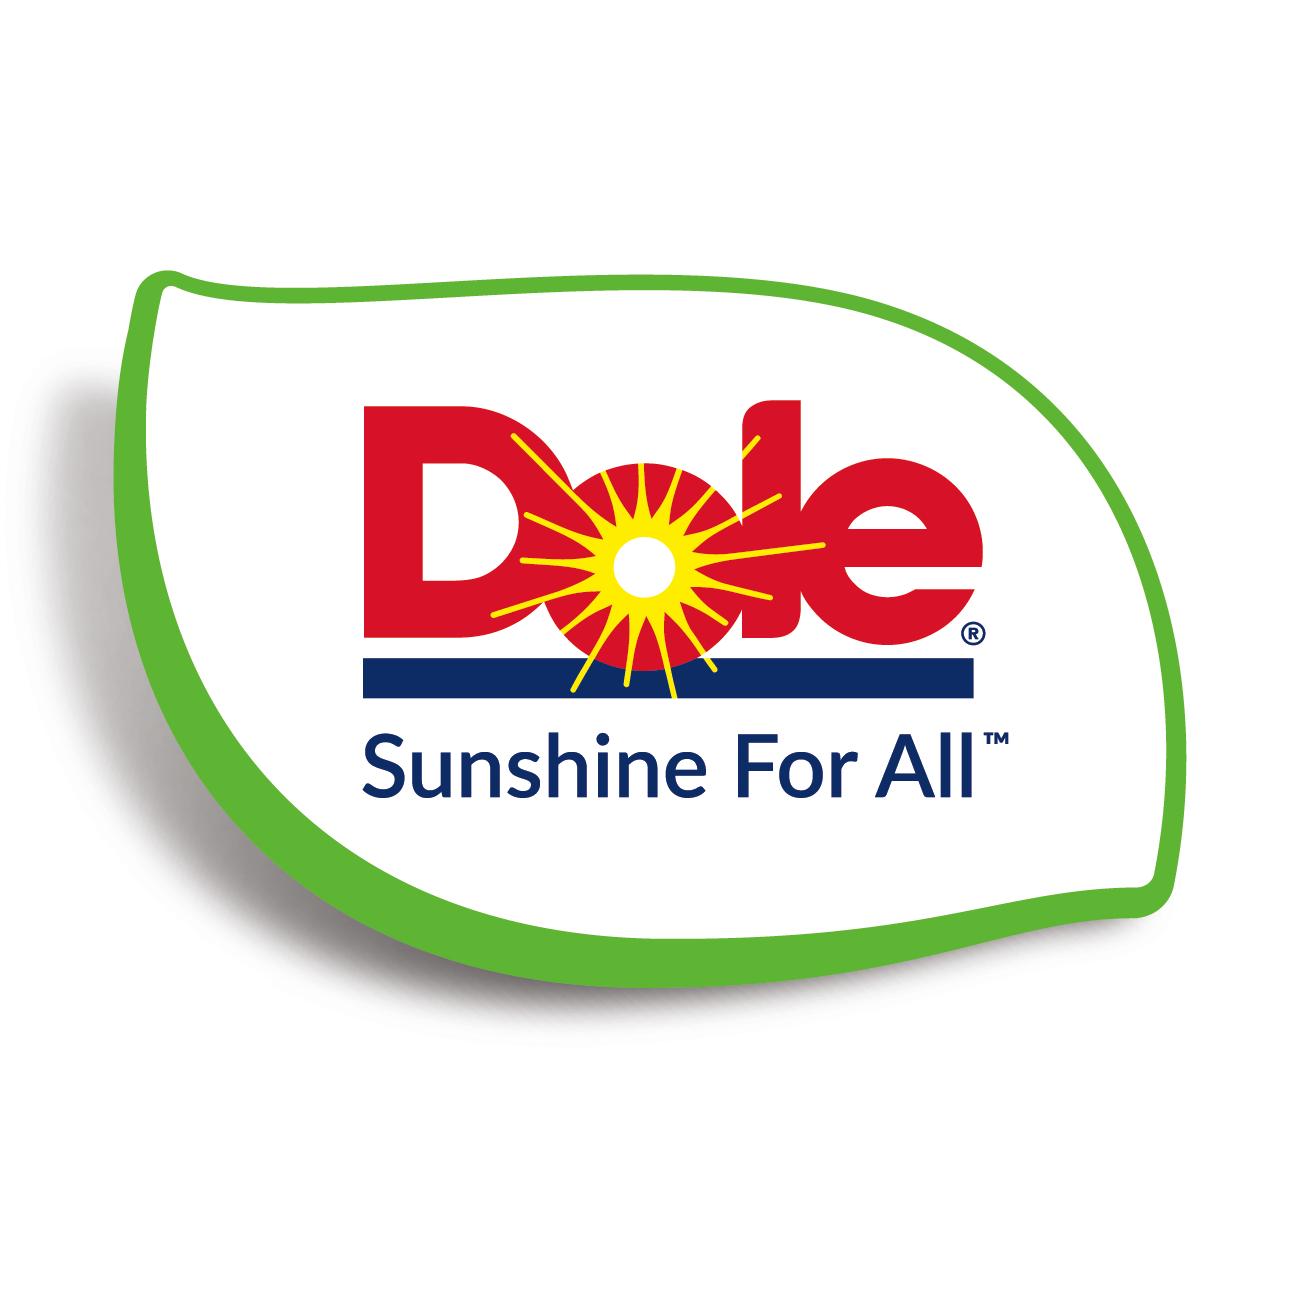 Dole Logo - Keto Certified by the Paleo Foundation